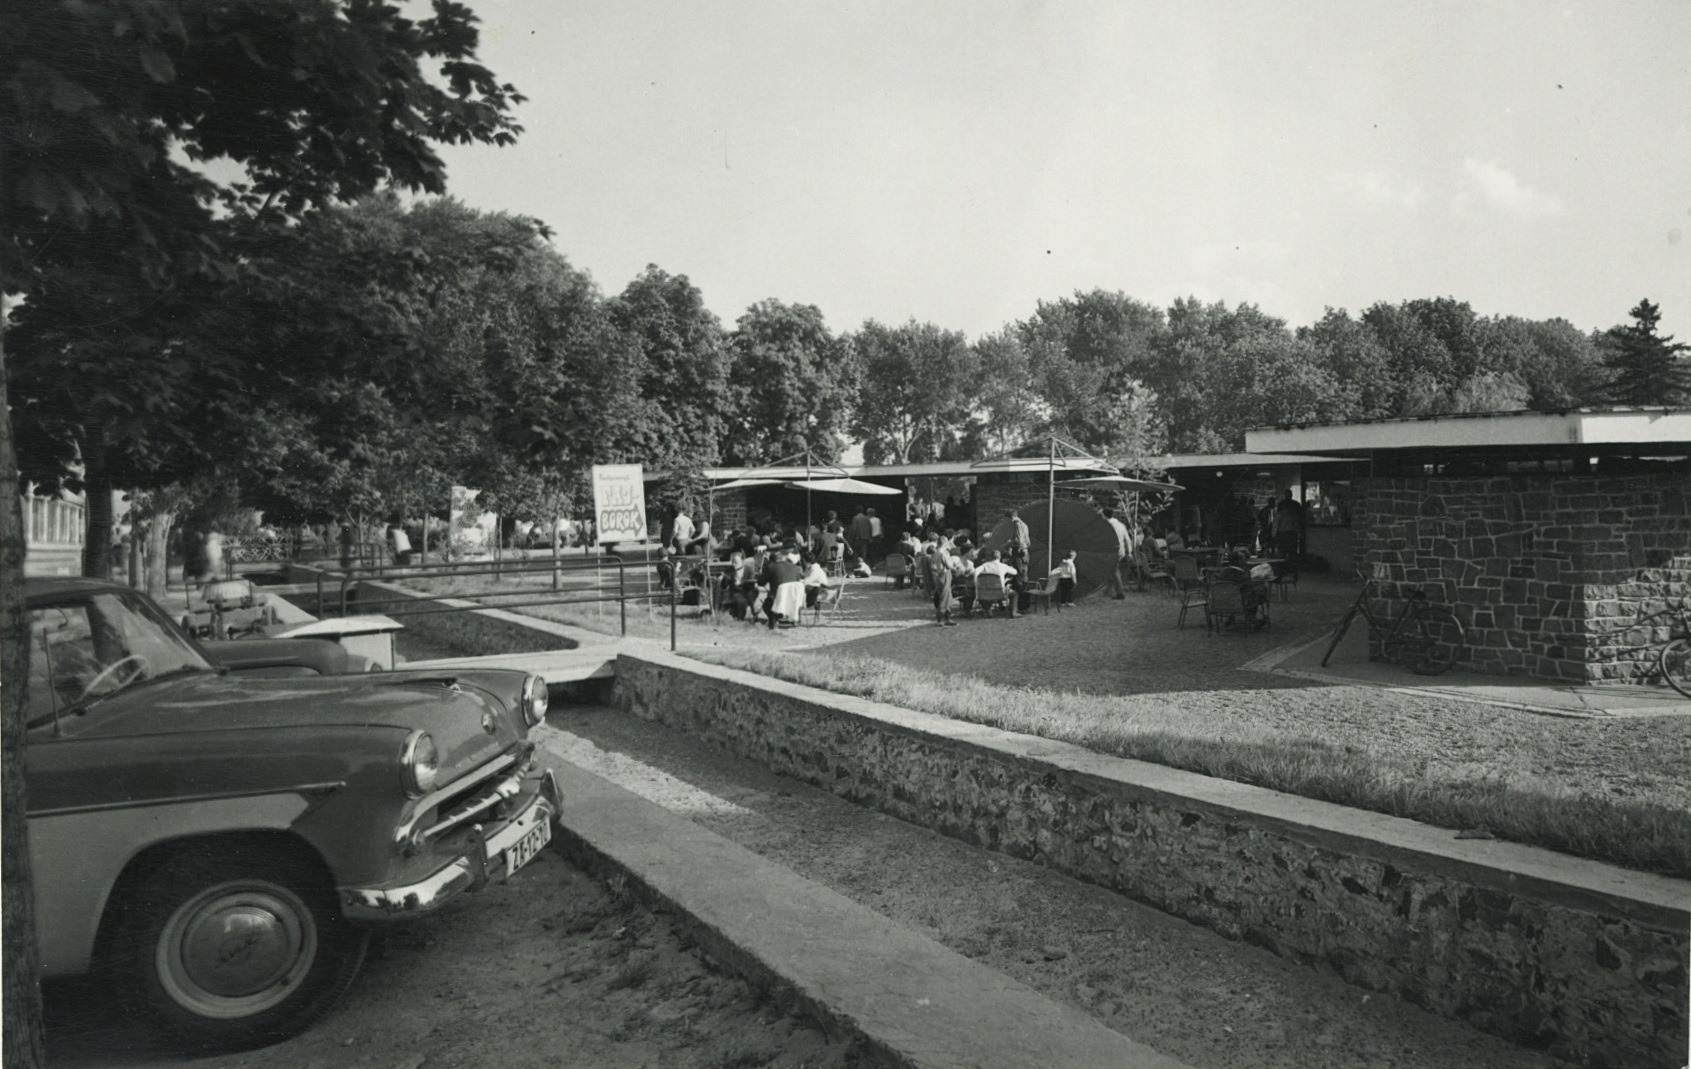 Badacsony üdülőközpontja üzletekkel